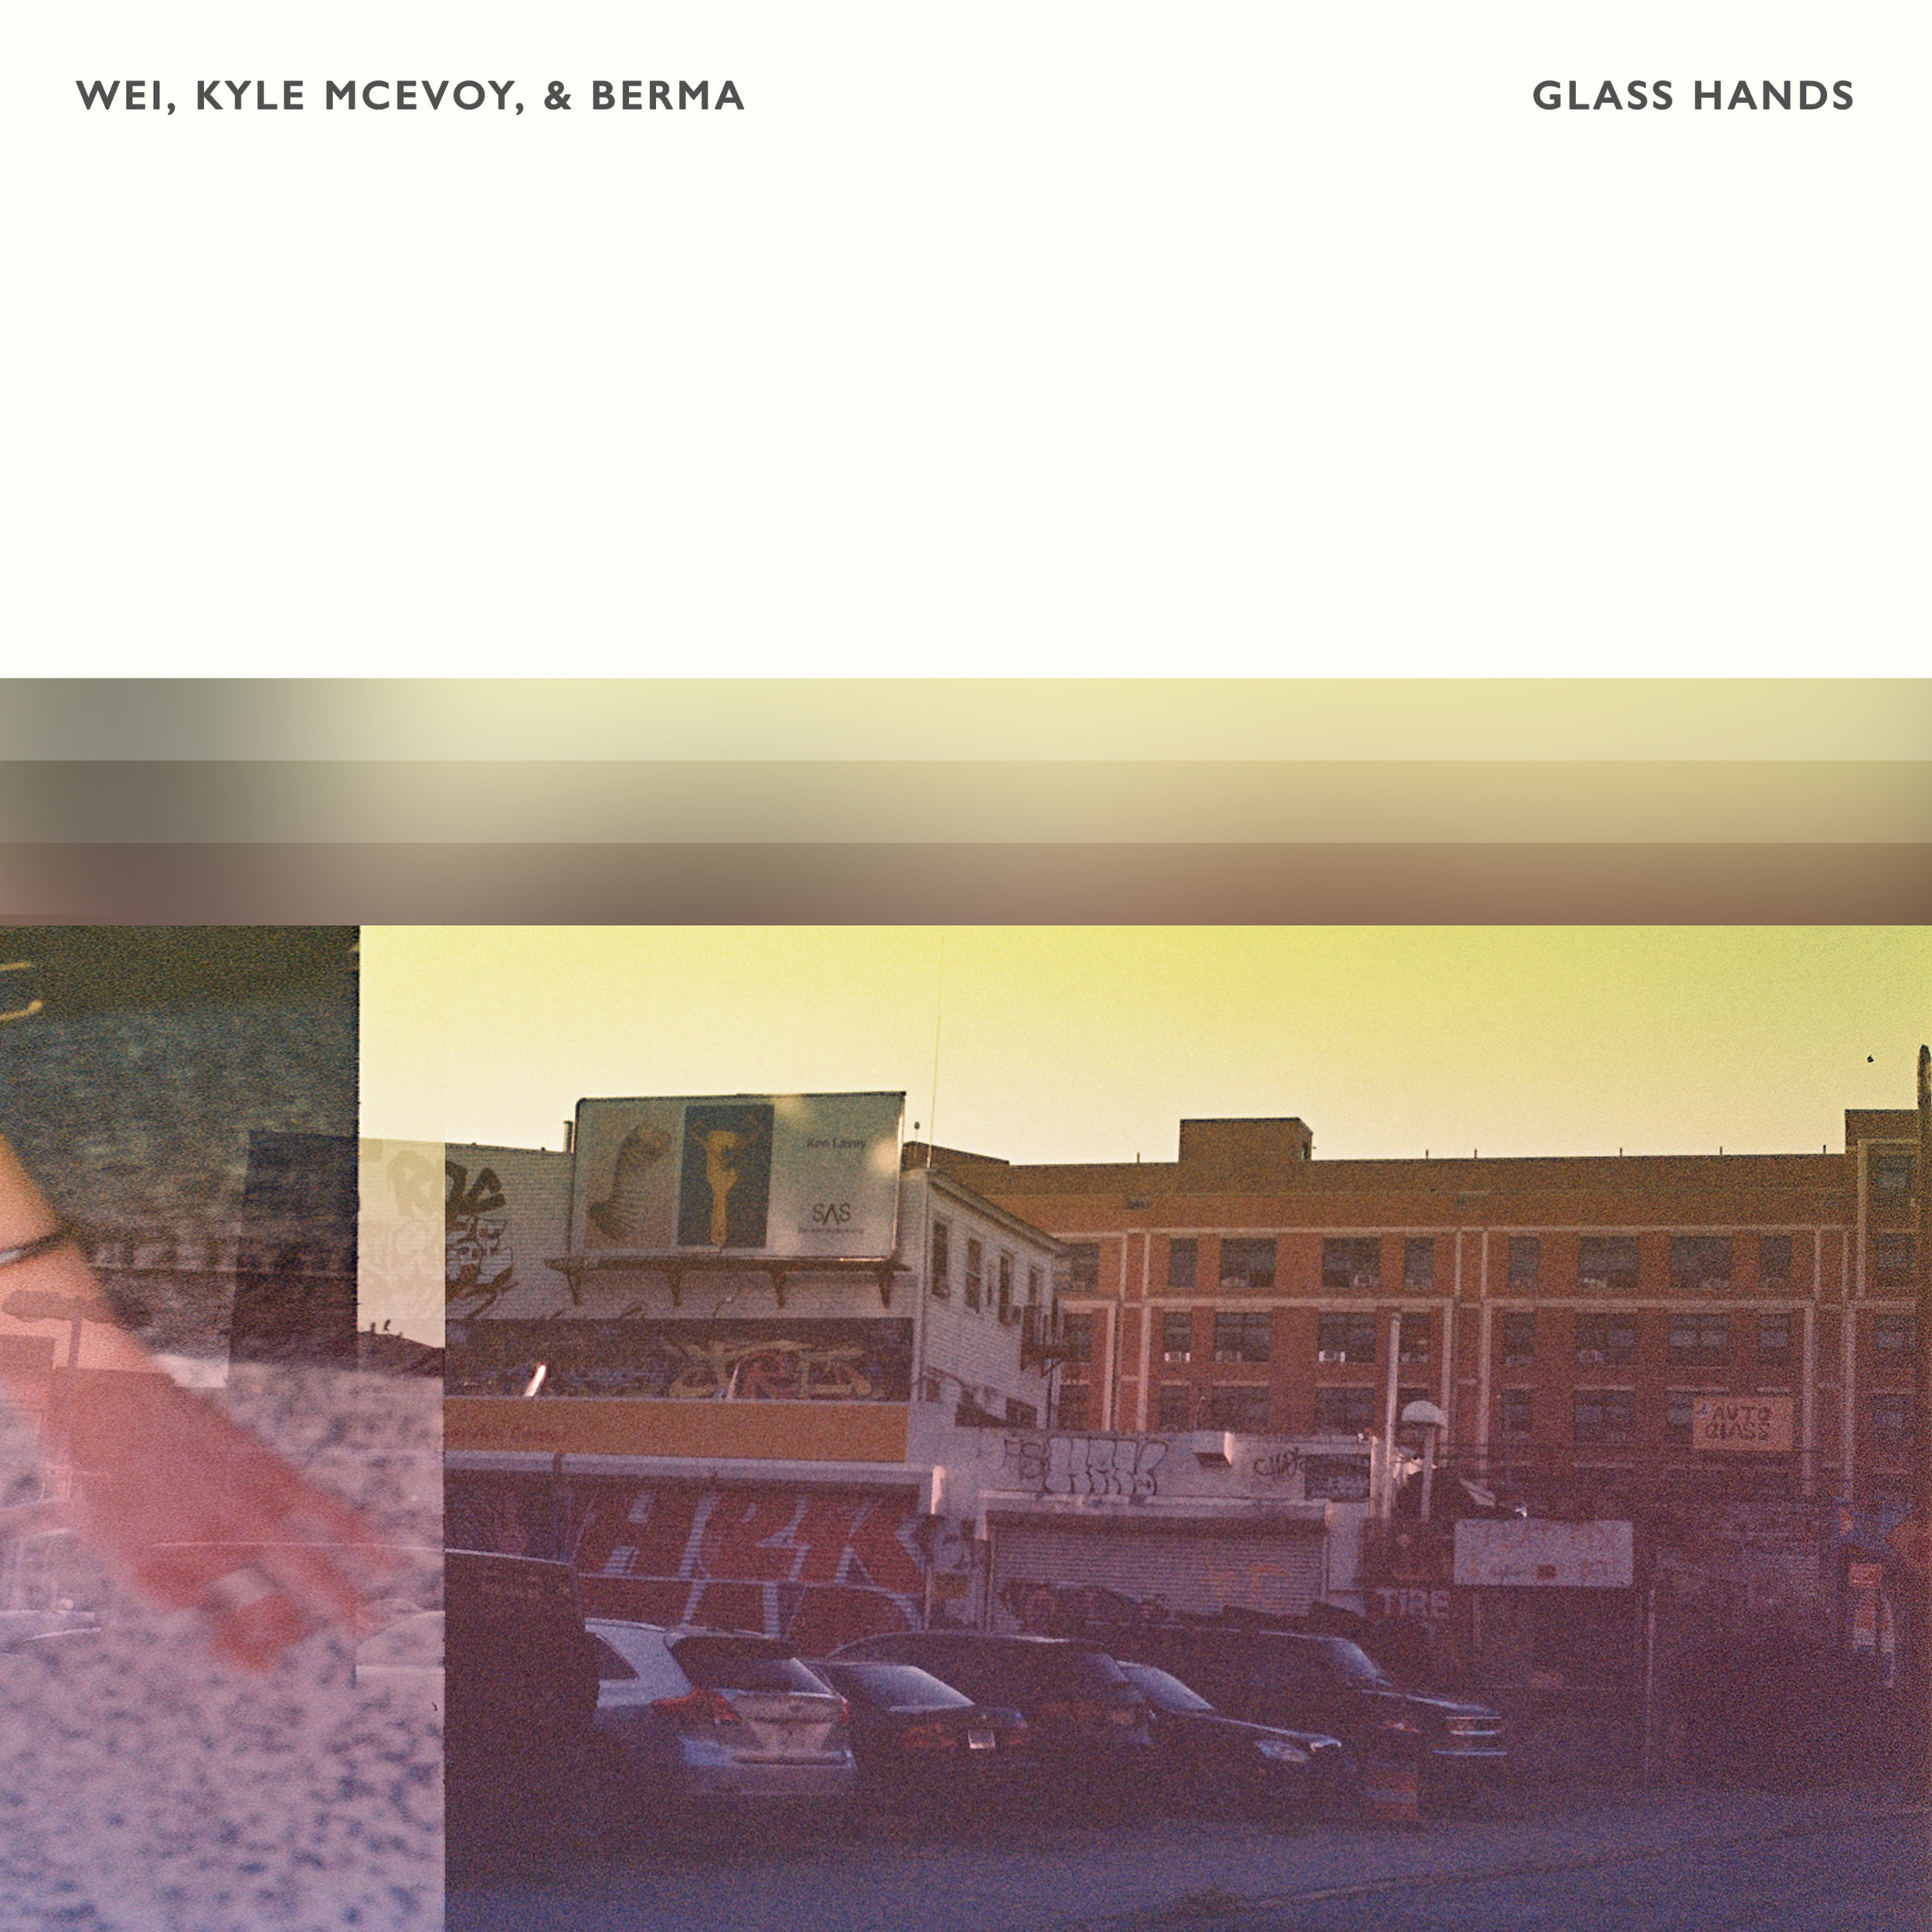 WEI, Kyle McEvoy & Berma - Glass Hands